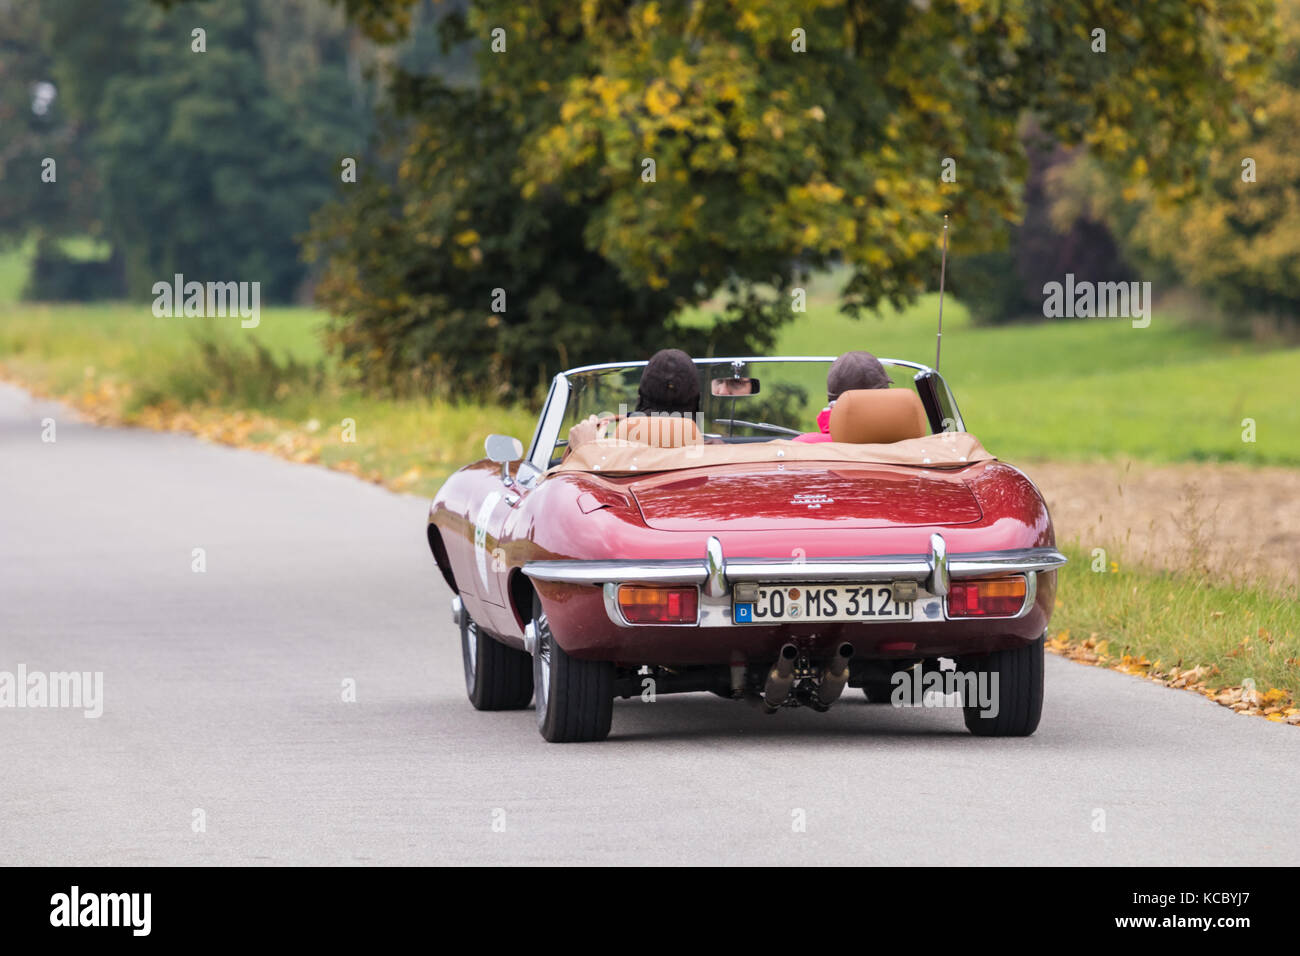 Augsburg, Deutschland - 1. Oktober 2017: Jaguar E-type Oldtimer Auto an der fuggerstadt Classic 2017 Oldtimer Rallye Stockbild